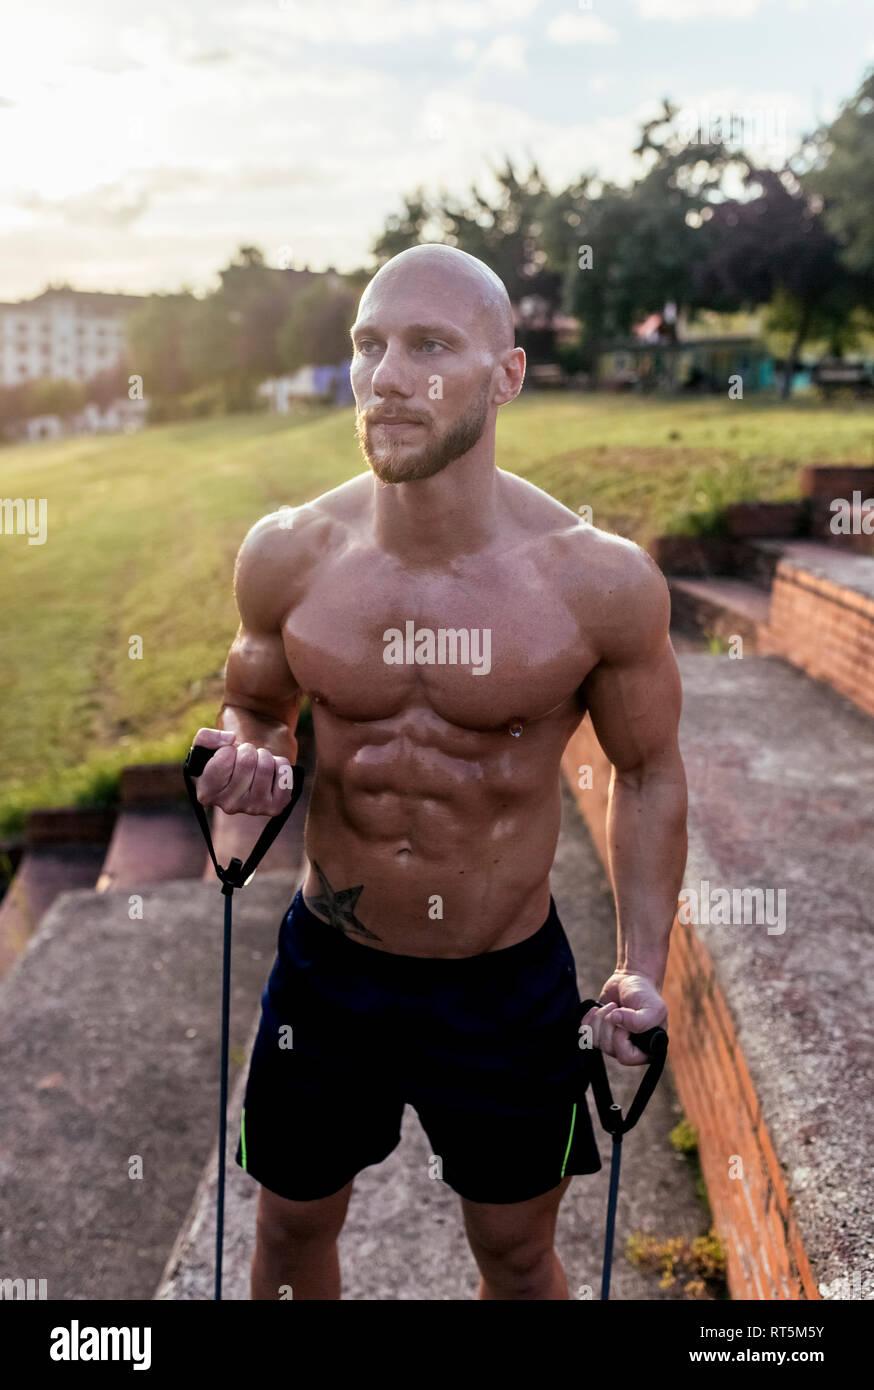 Barechested muskulösen Mann Training mit Expander im Freien Stockbild